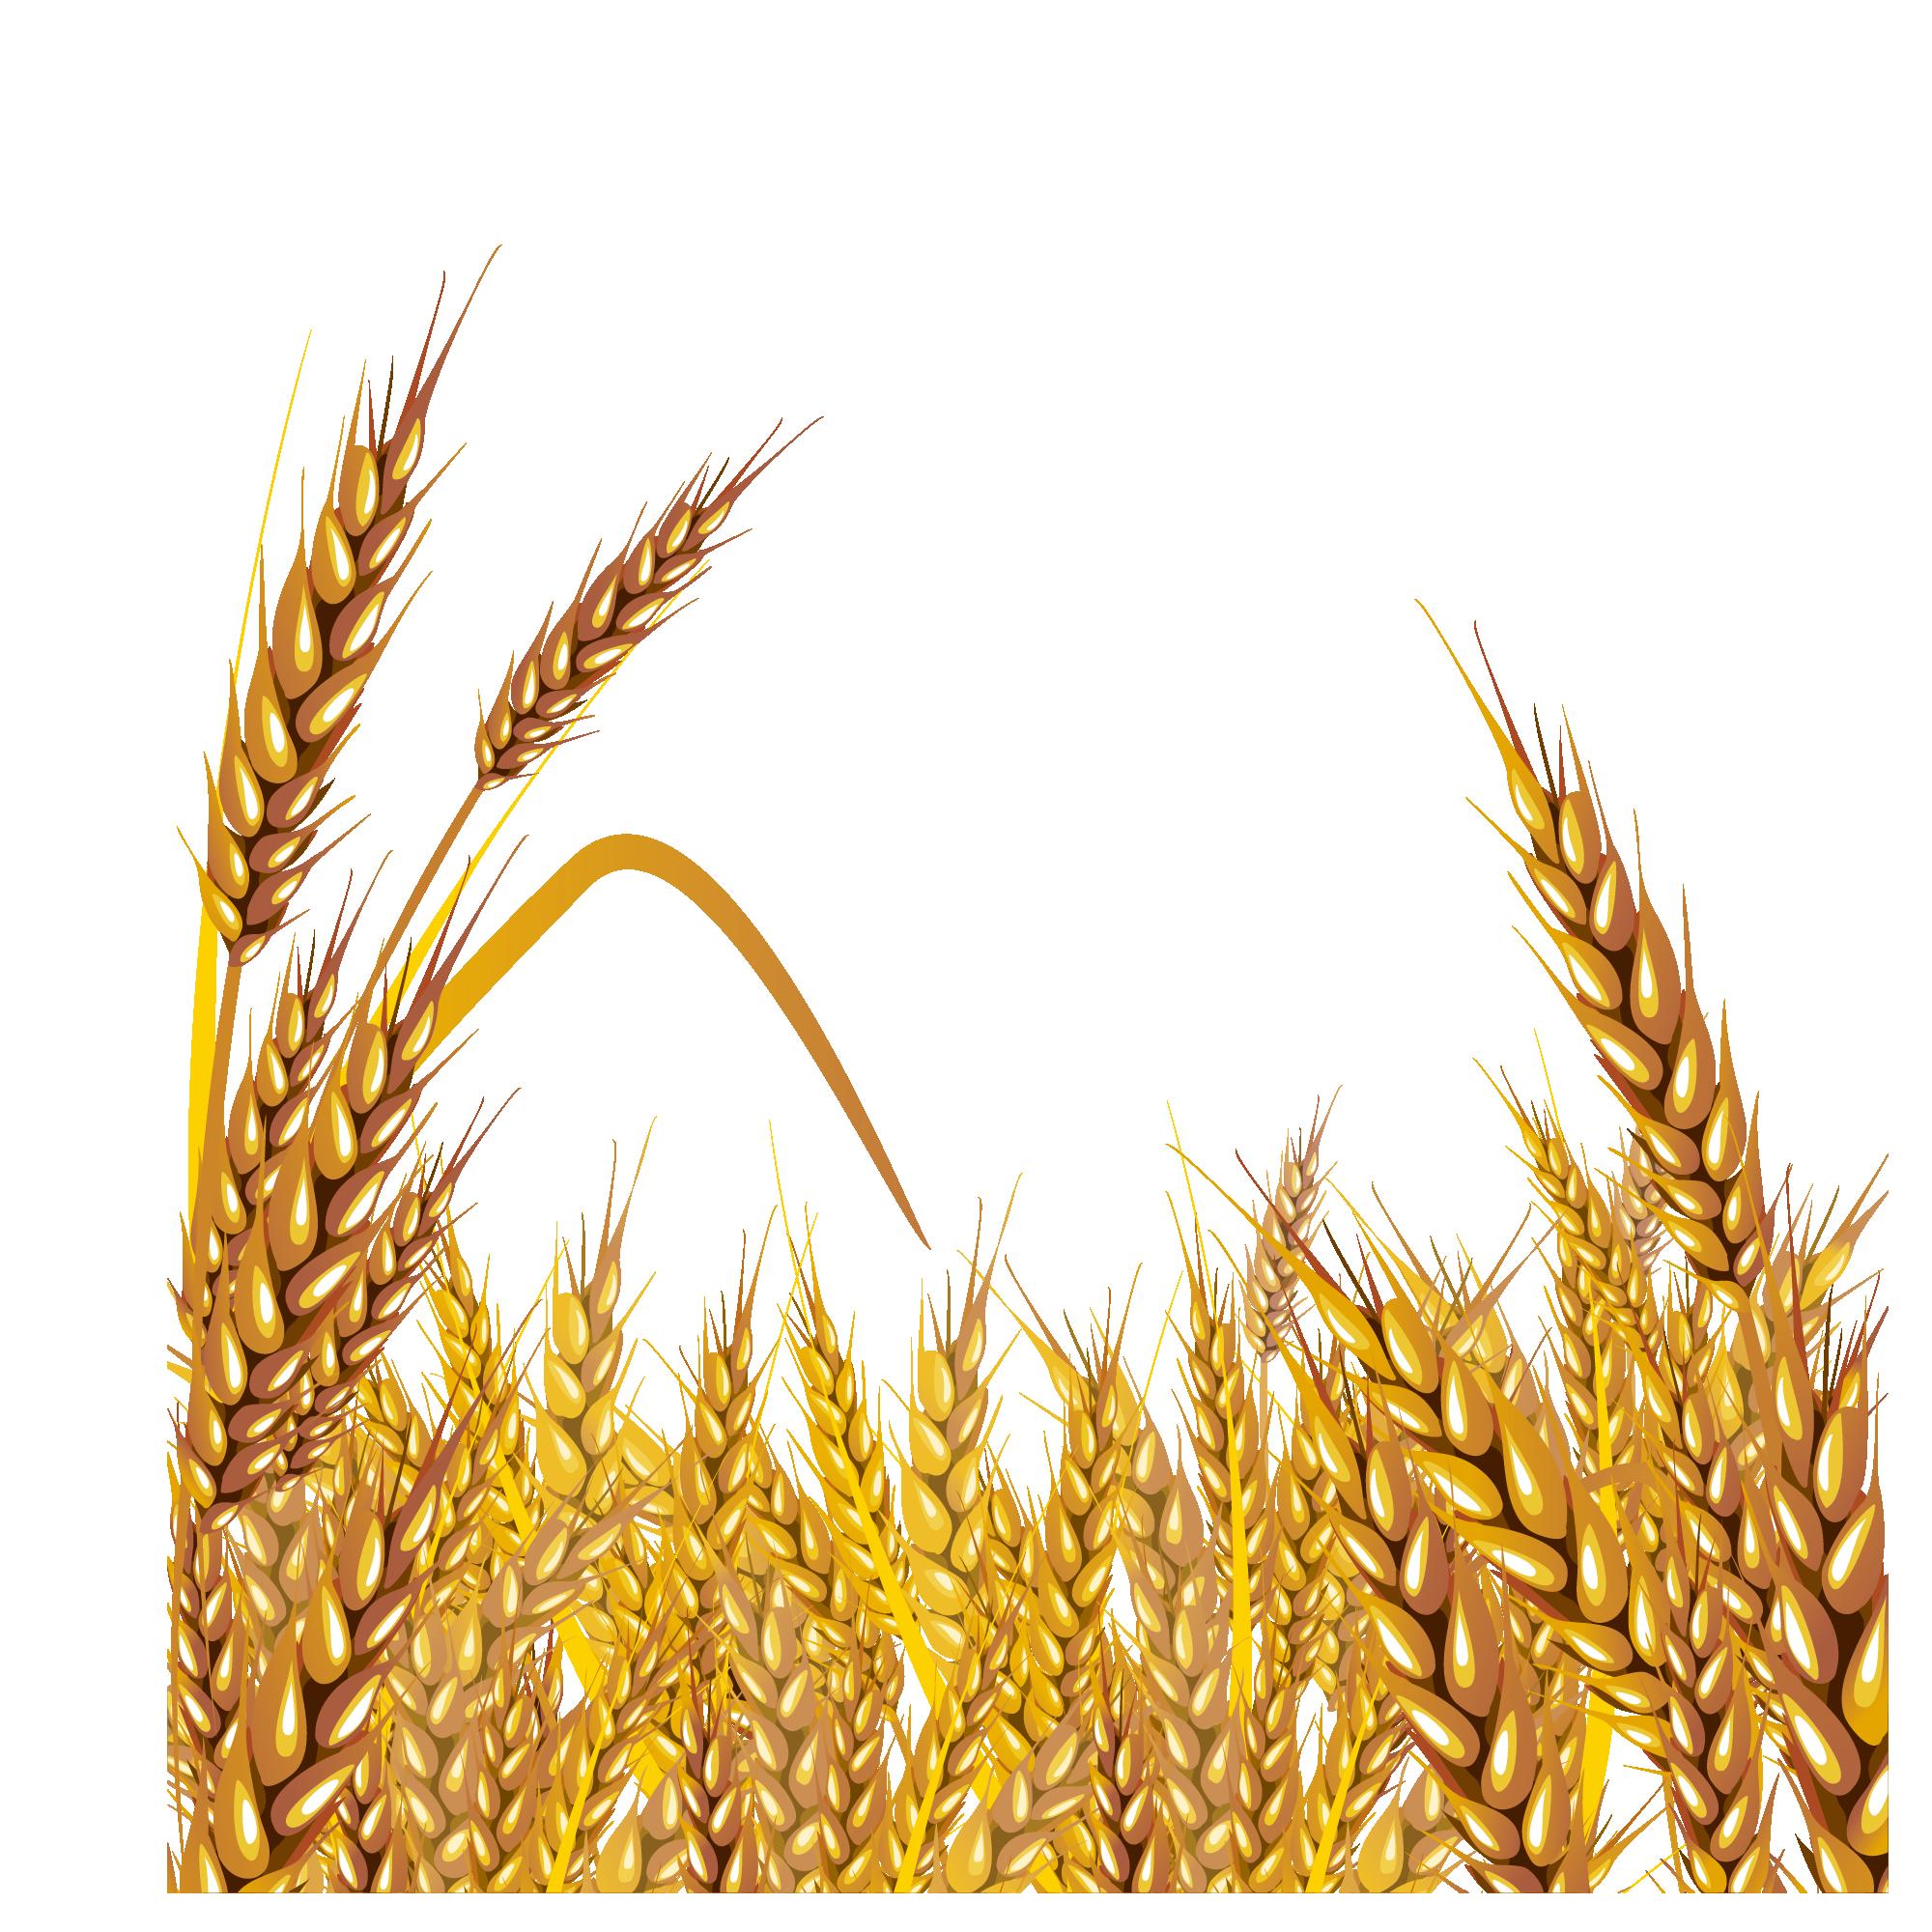 Grain clipart malt. Free on dumielauxepices net